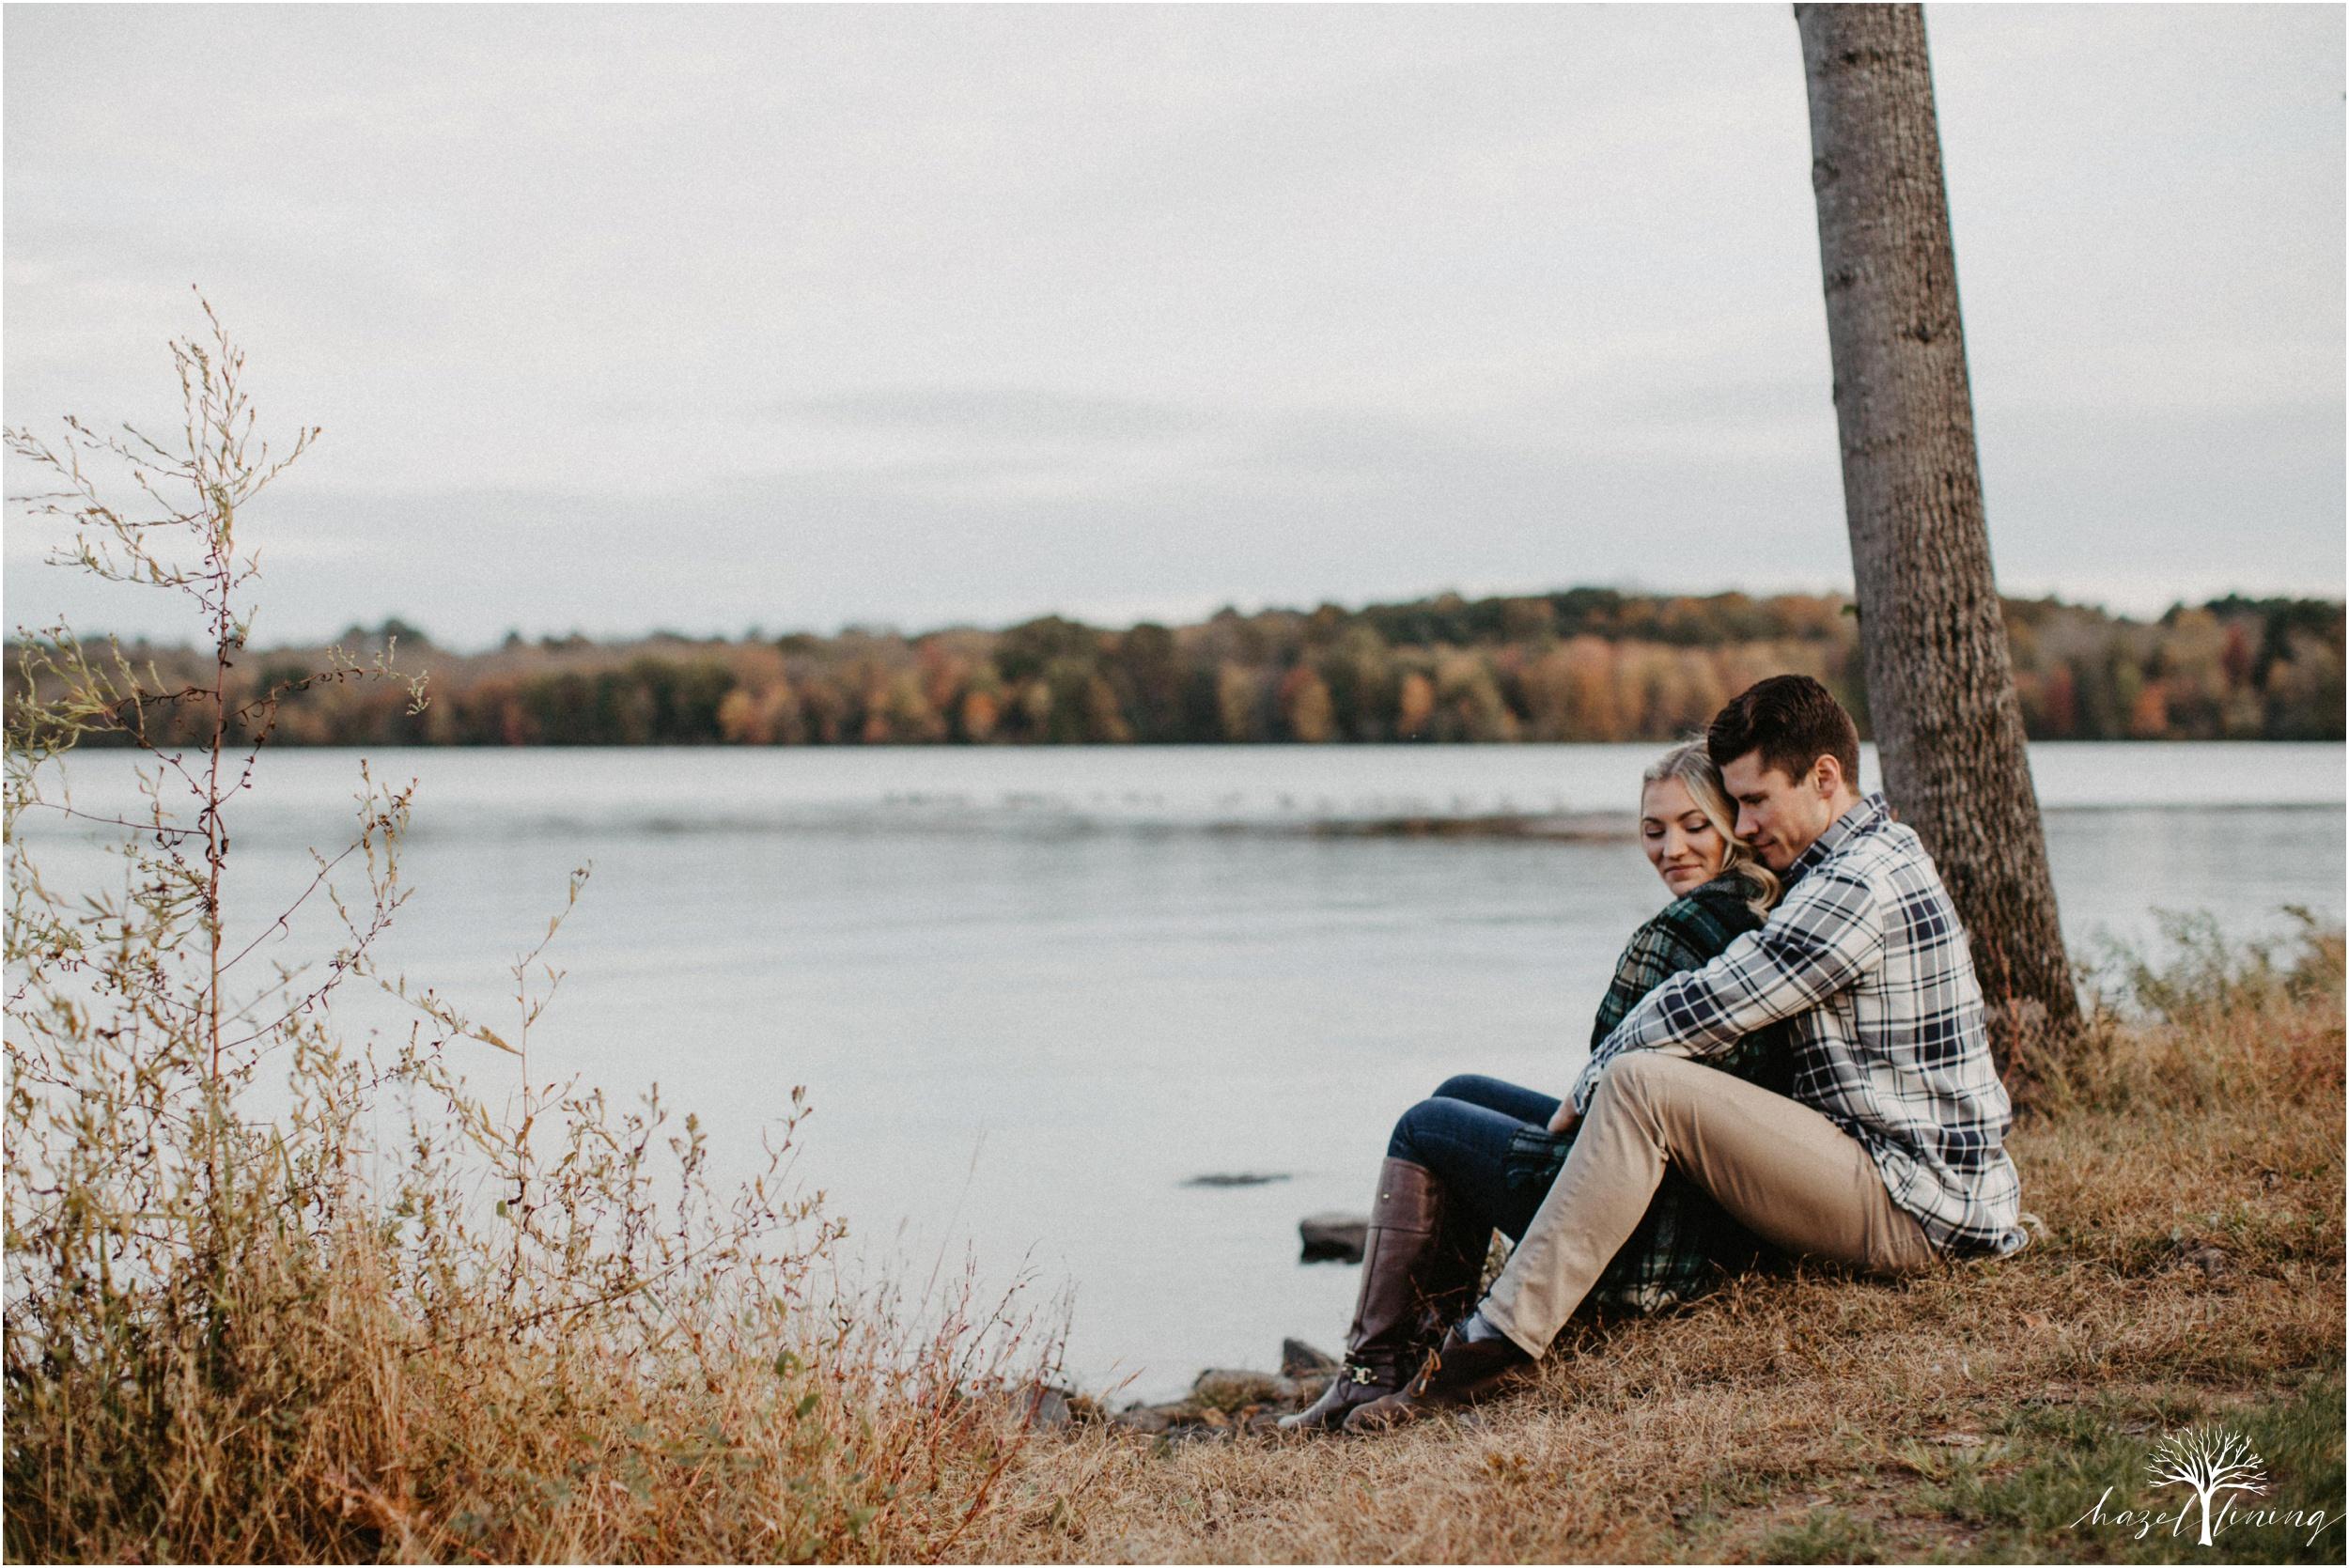 jessica-kern-david-siepietowski-lake-nockamixon-autumn-engagement-session_0033.jpg